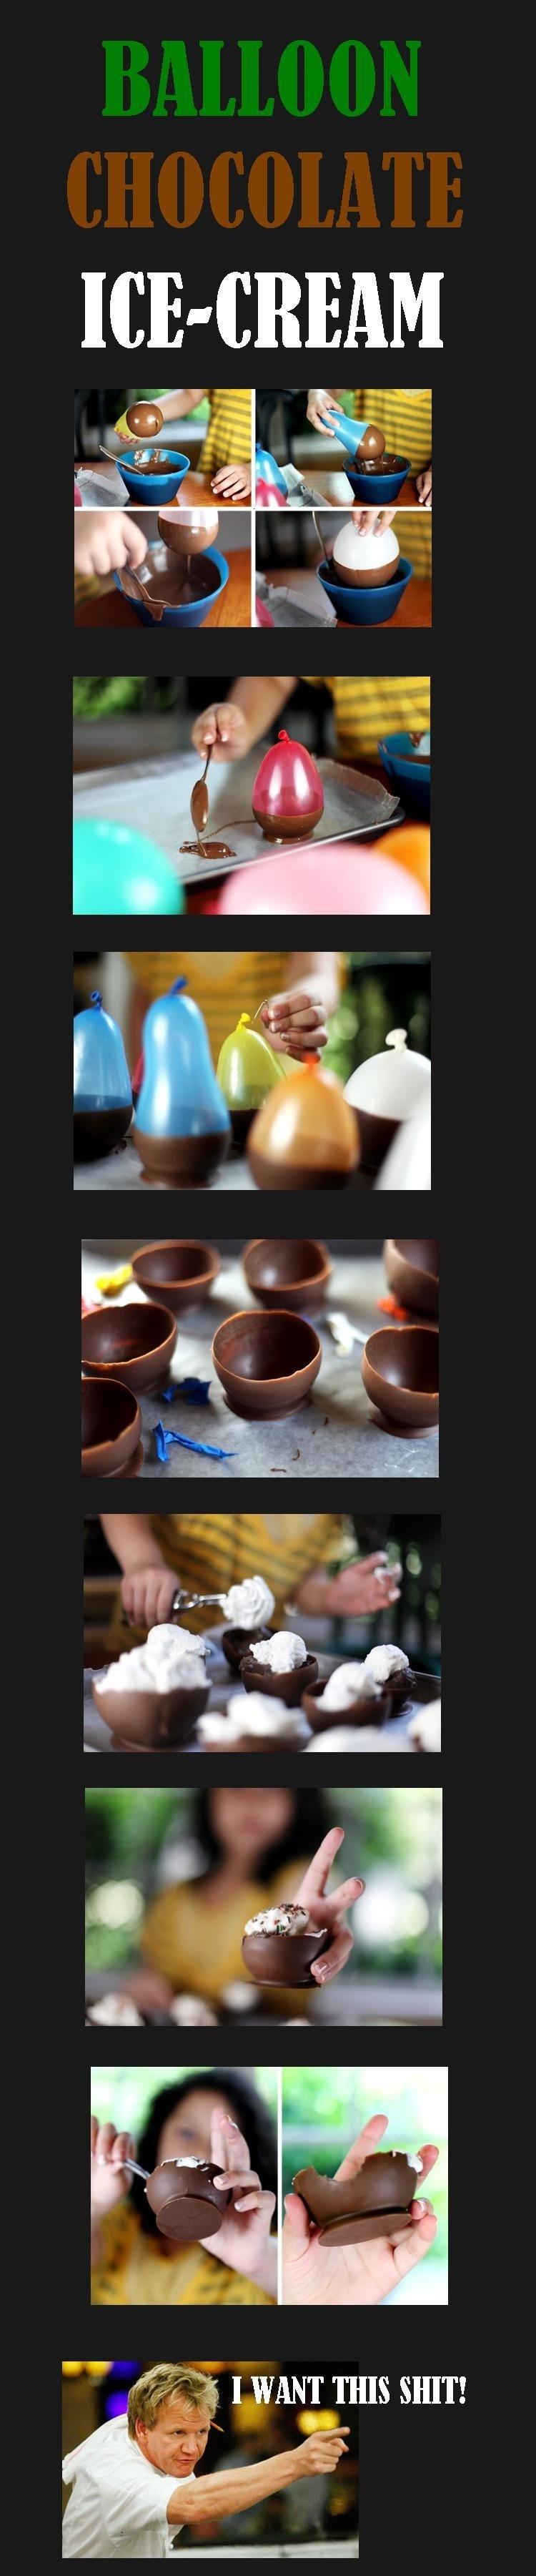 Balloon Chocolate Icecream. Uploaded by fungusamongus. ICESCREAM. Probably smells like latex.